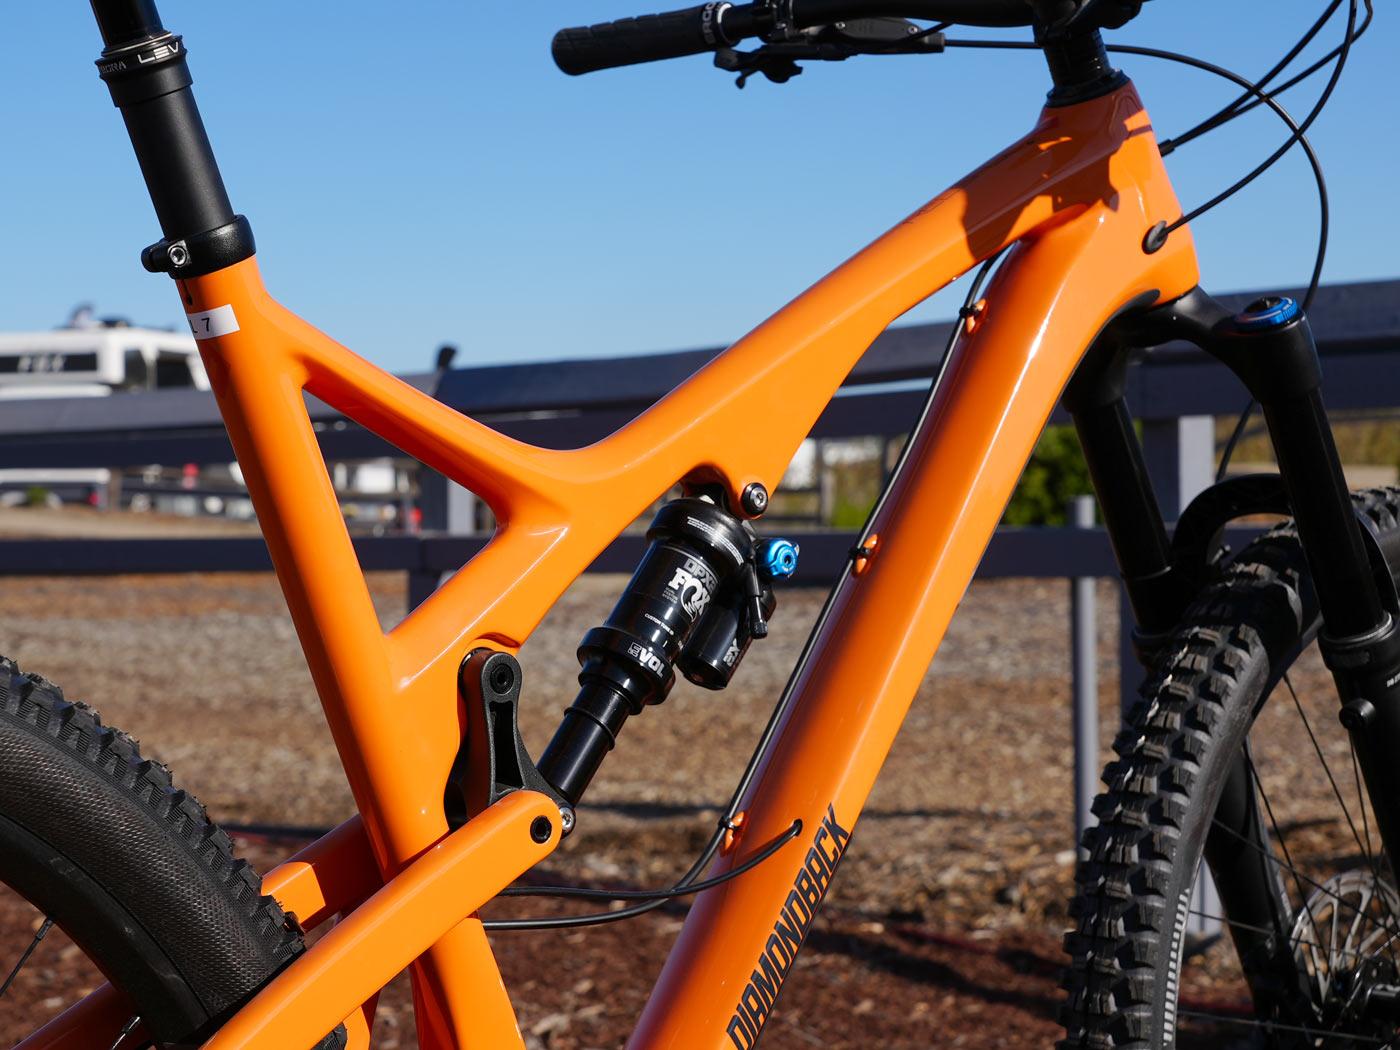 Diamondback Release 5C upgrades its spec, still rockin' 27.5″ wheels for now thumbnail